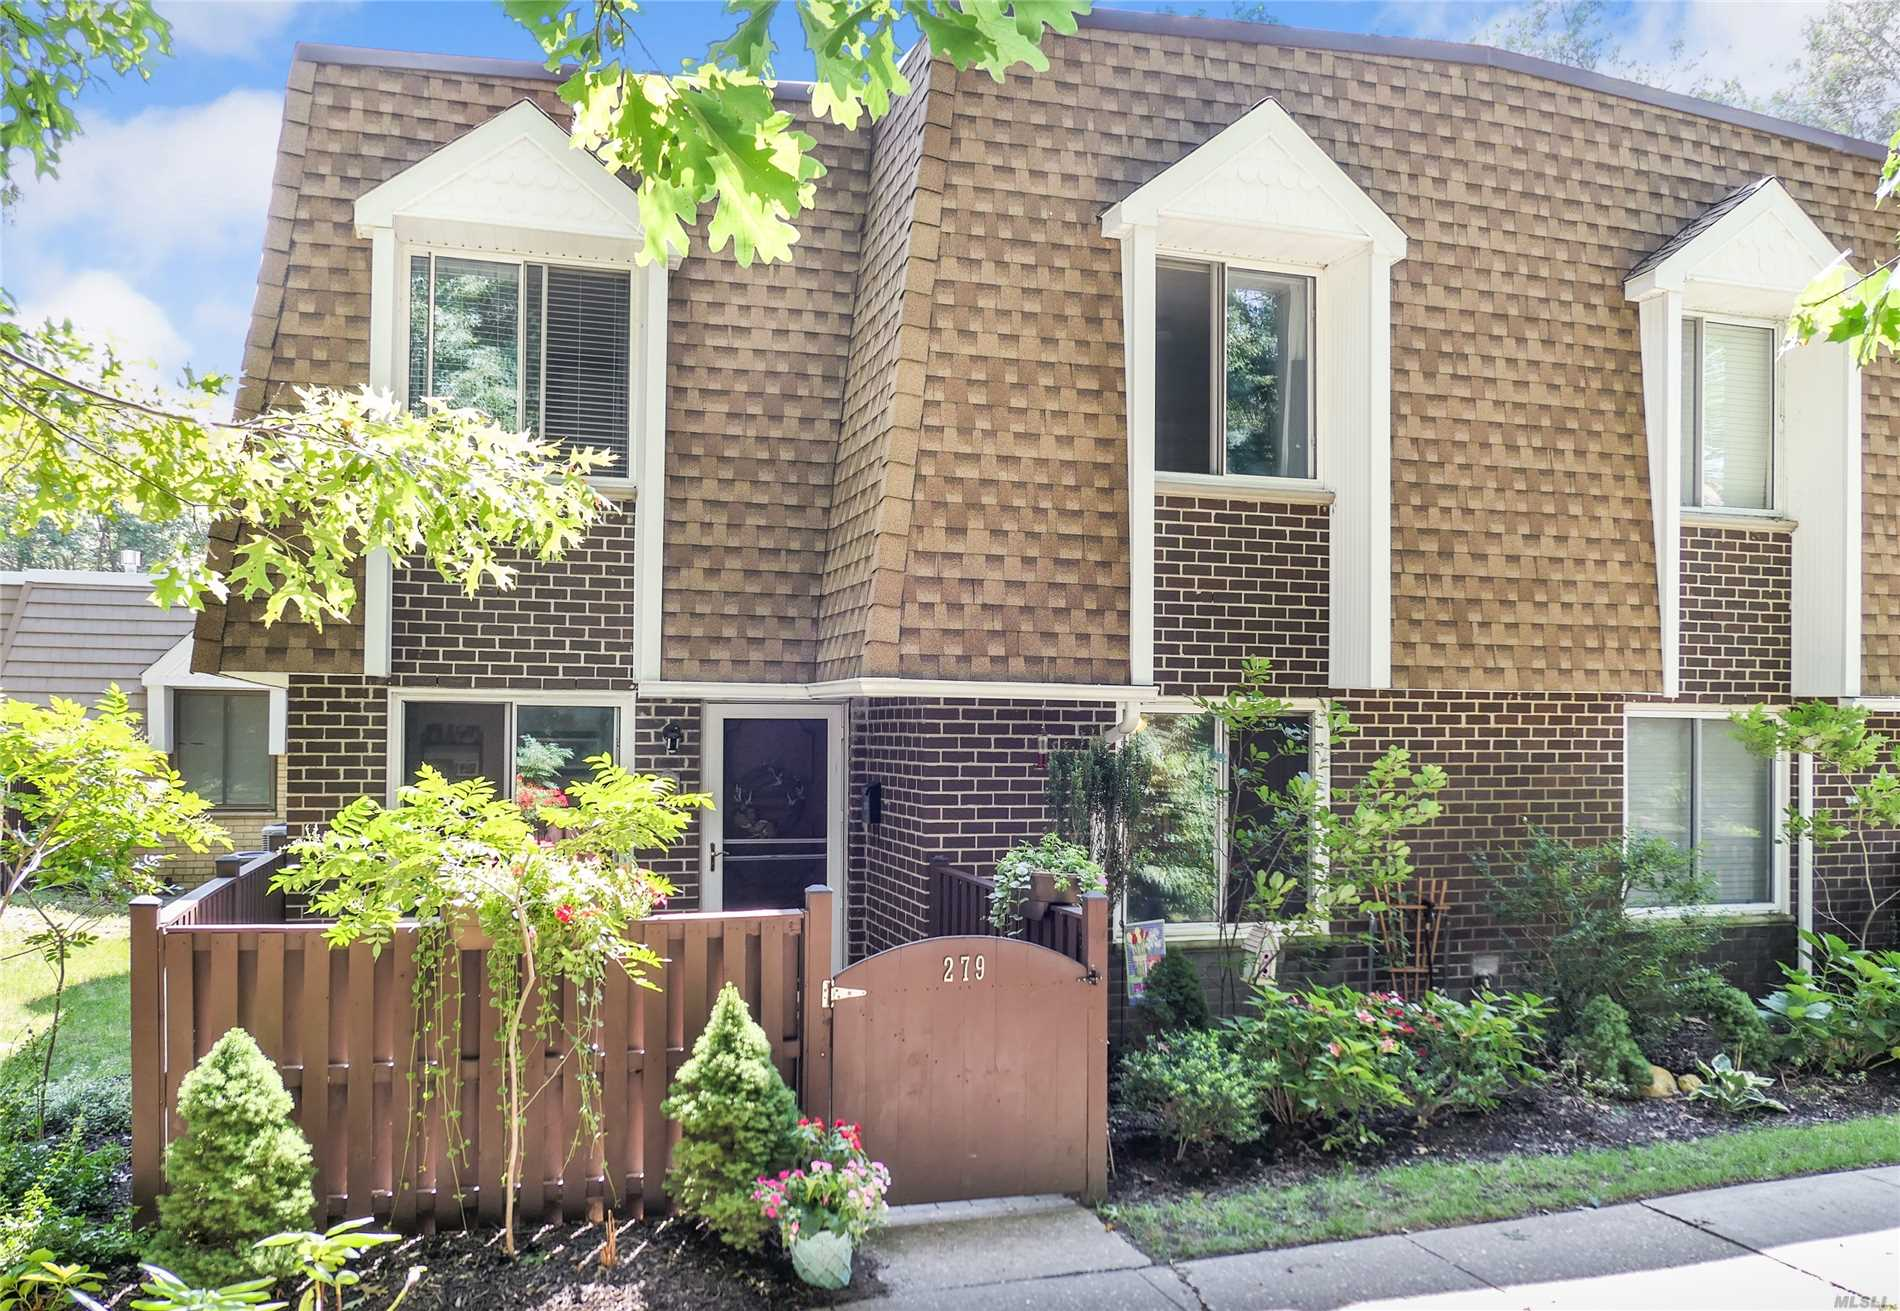 Property for sale at 279 Sagamore Hills Dr, Pt.Jefferson Sta,  NY 11776